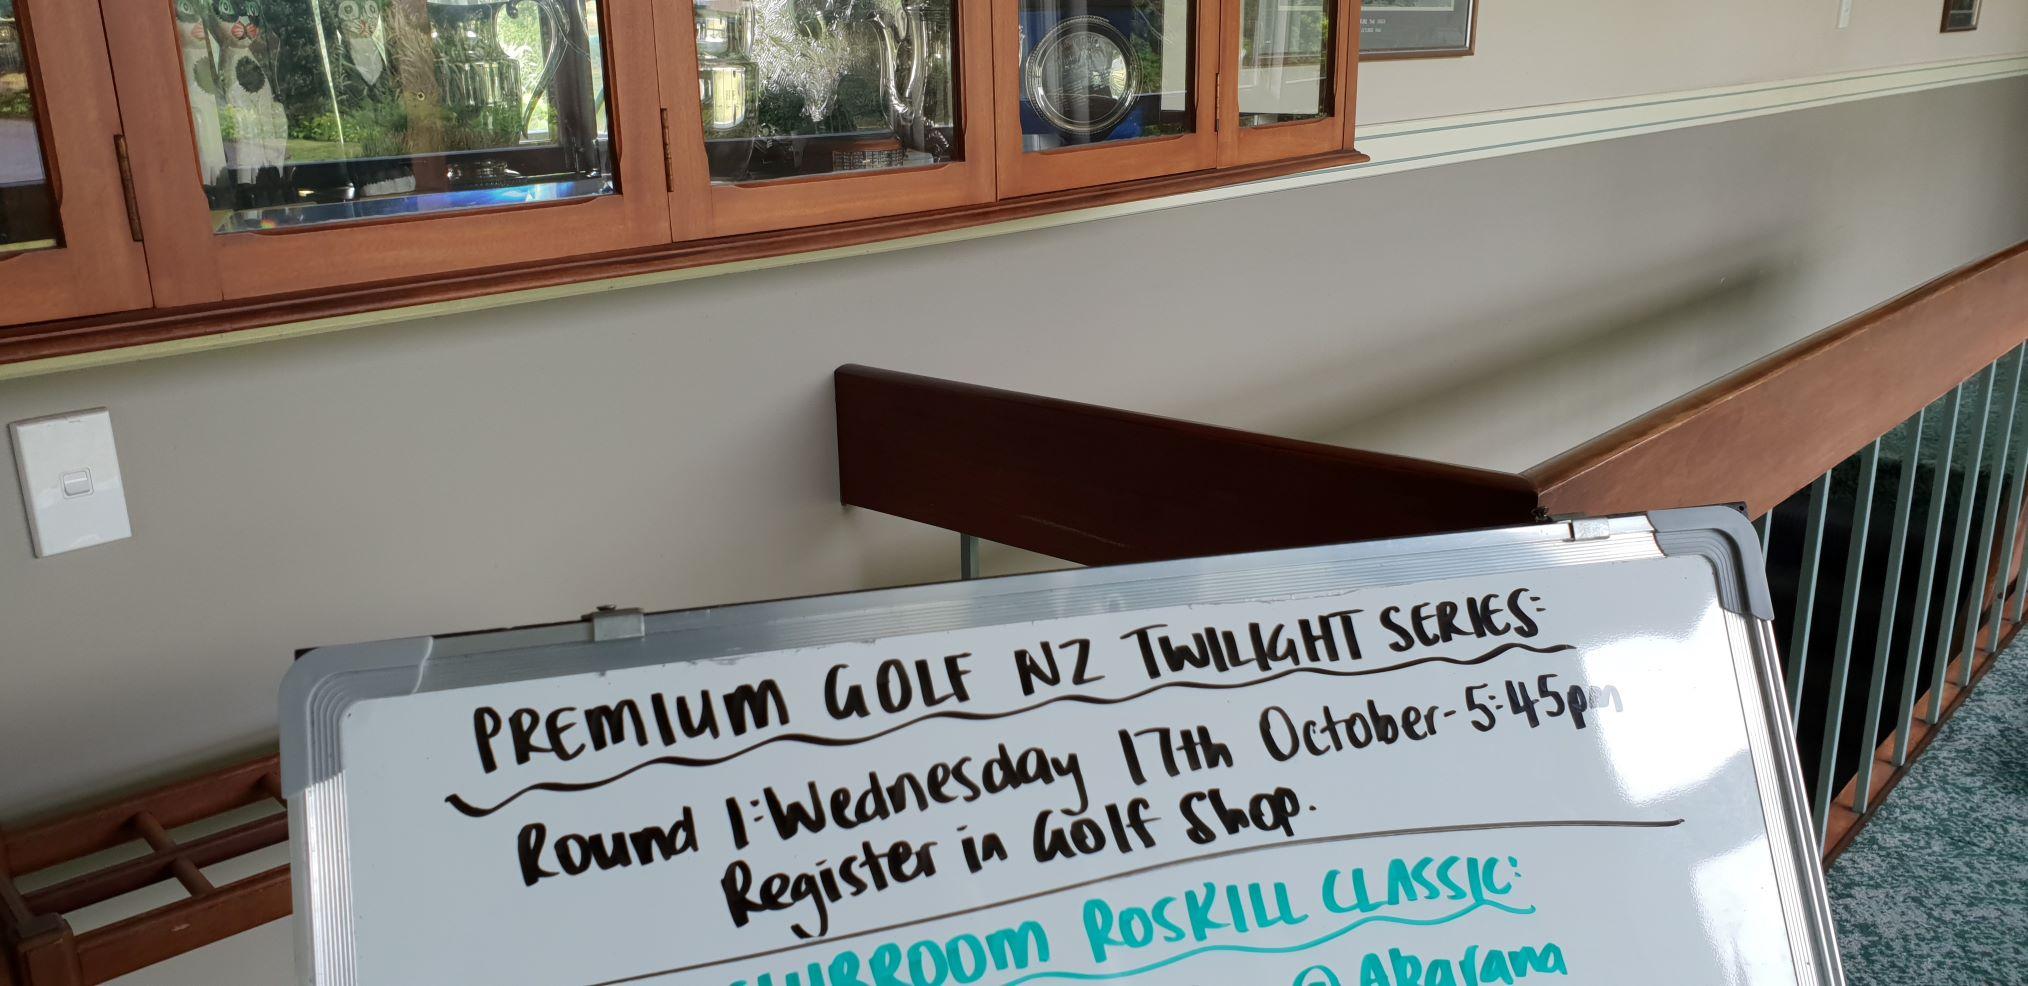 Premium Golf NZ Twilight Series Club Noticeboard.jpg